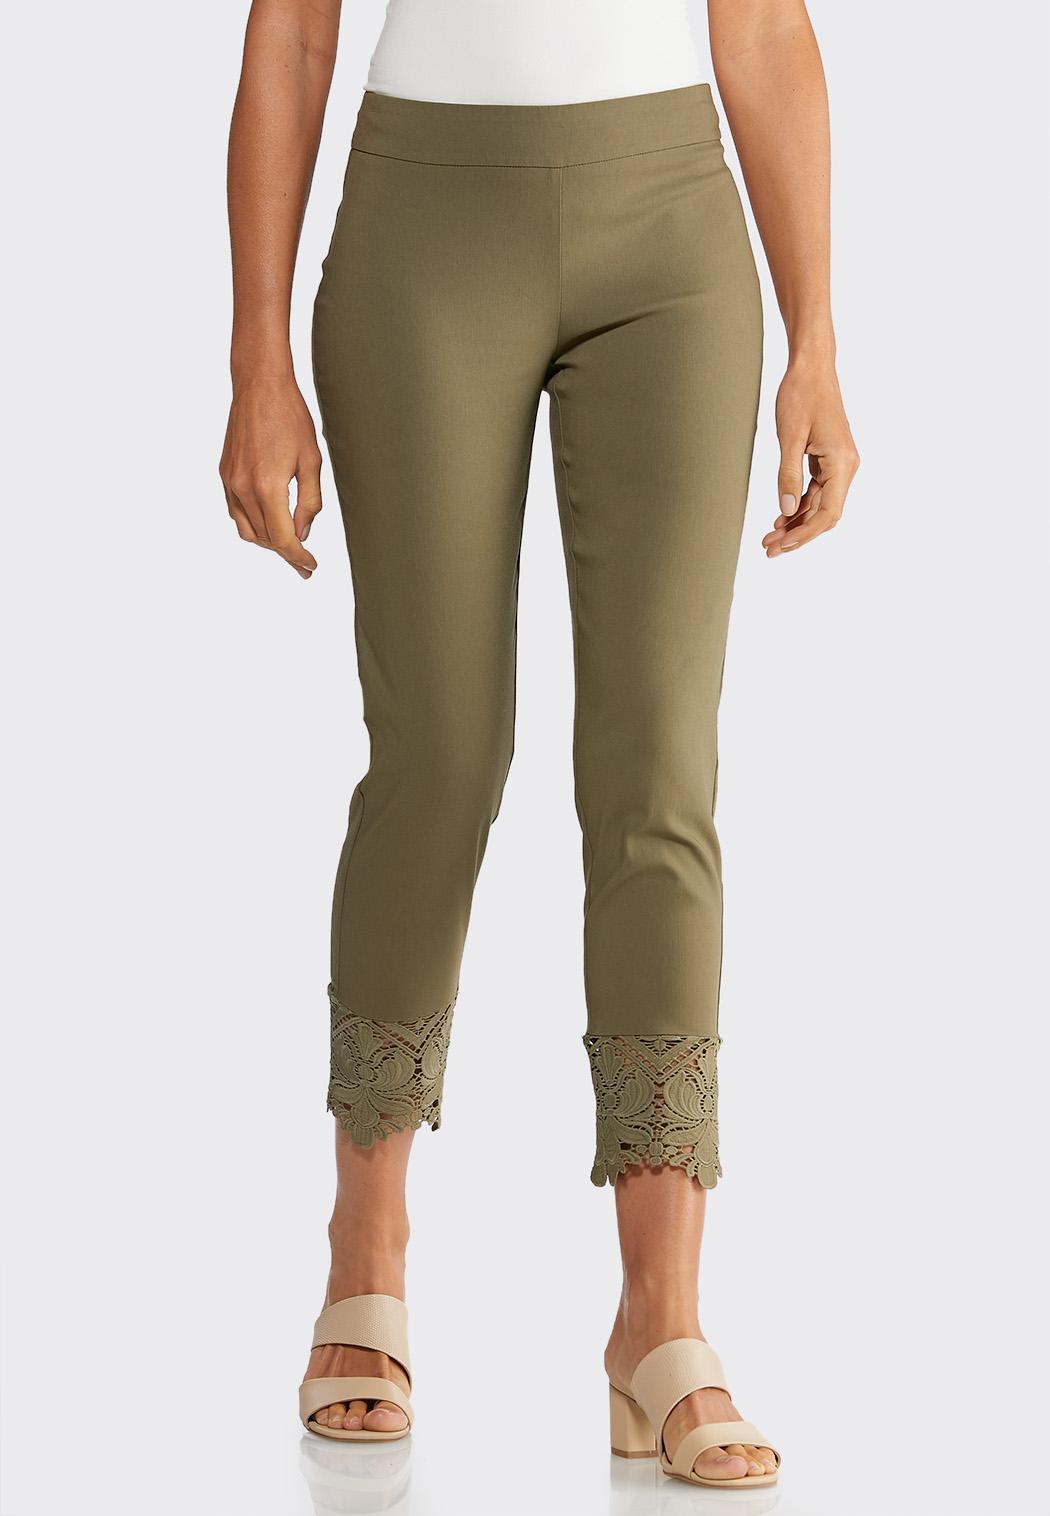 645faa280b Women's Pants - Palazzo Pants, Slim Leg, Skinny Leg Pants, Leggings & More